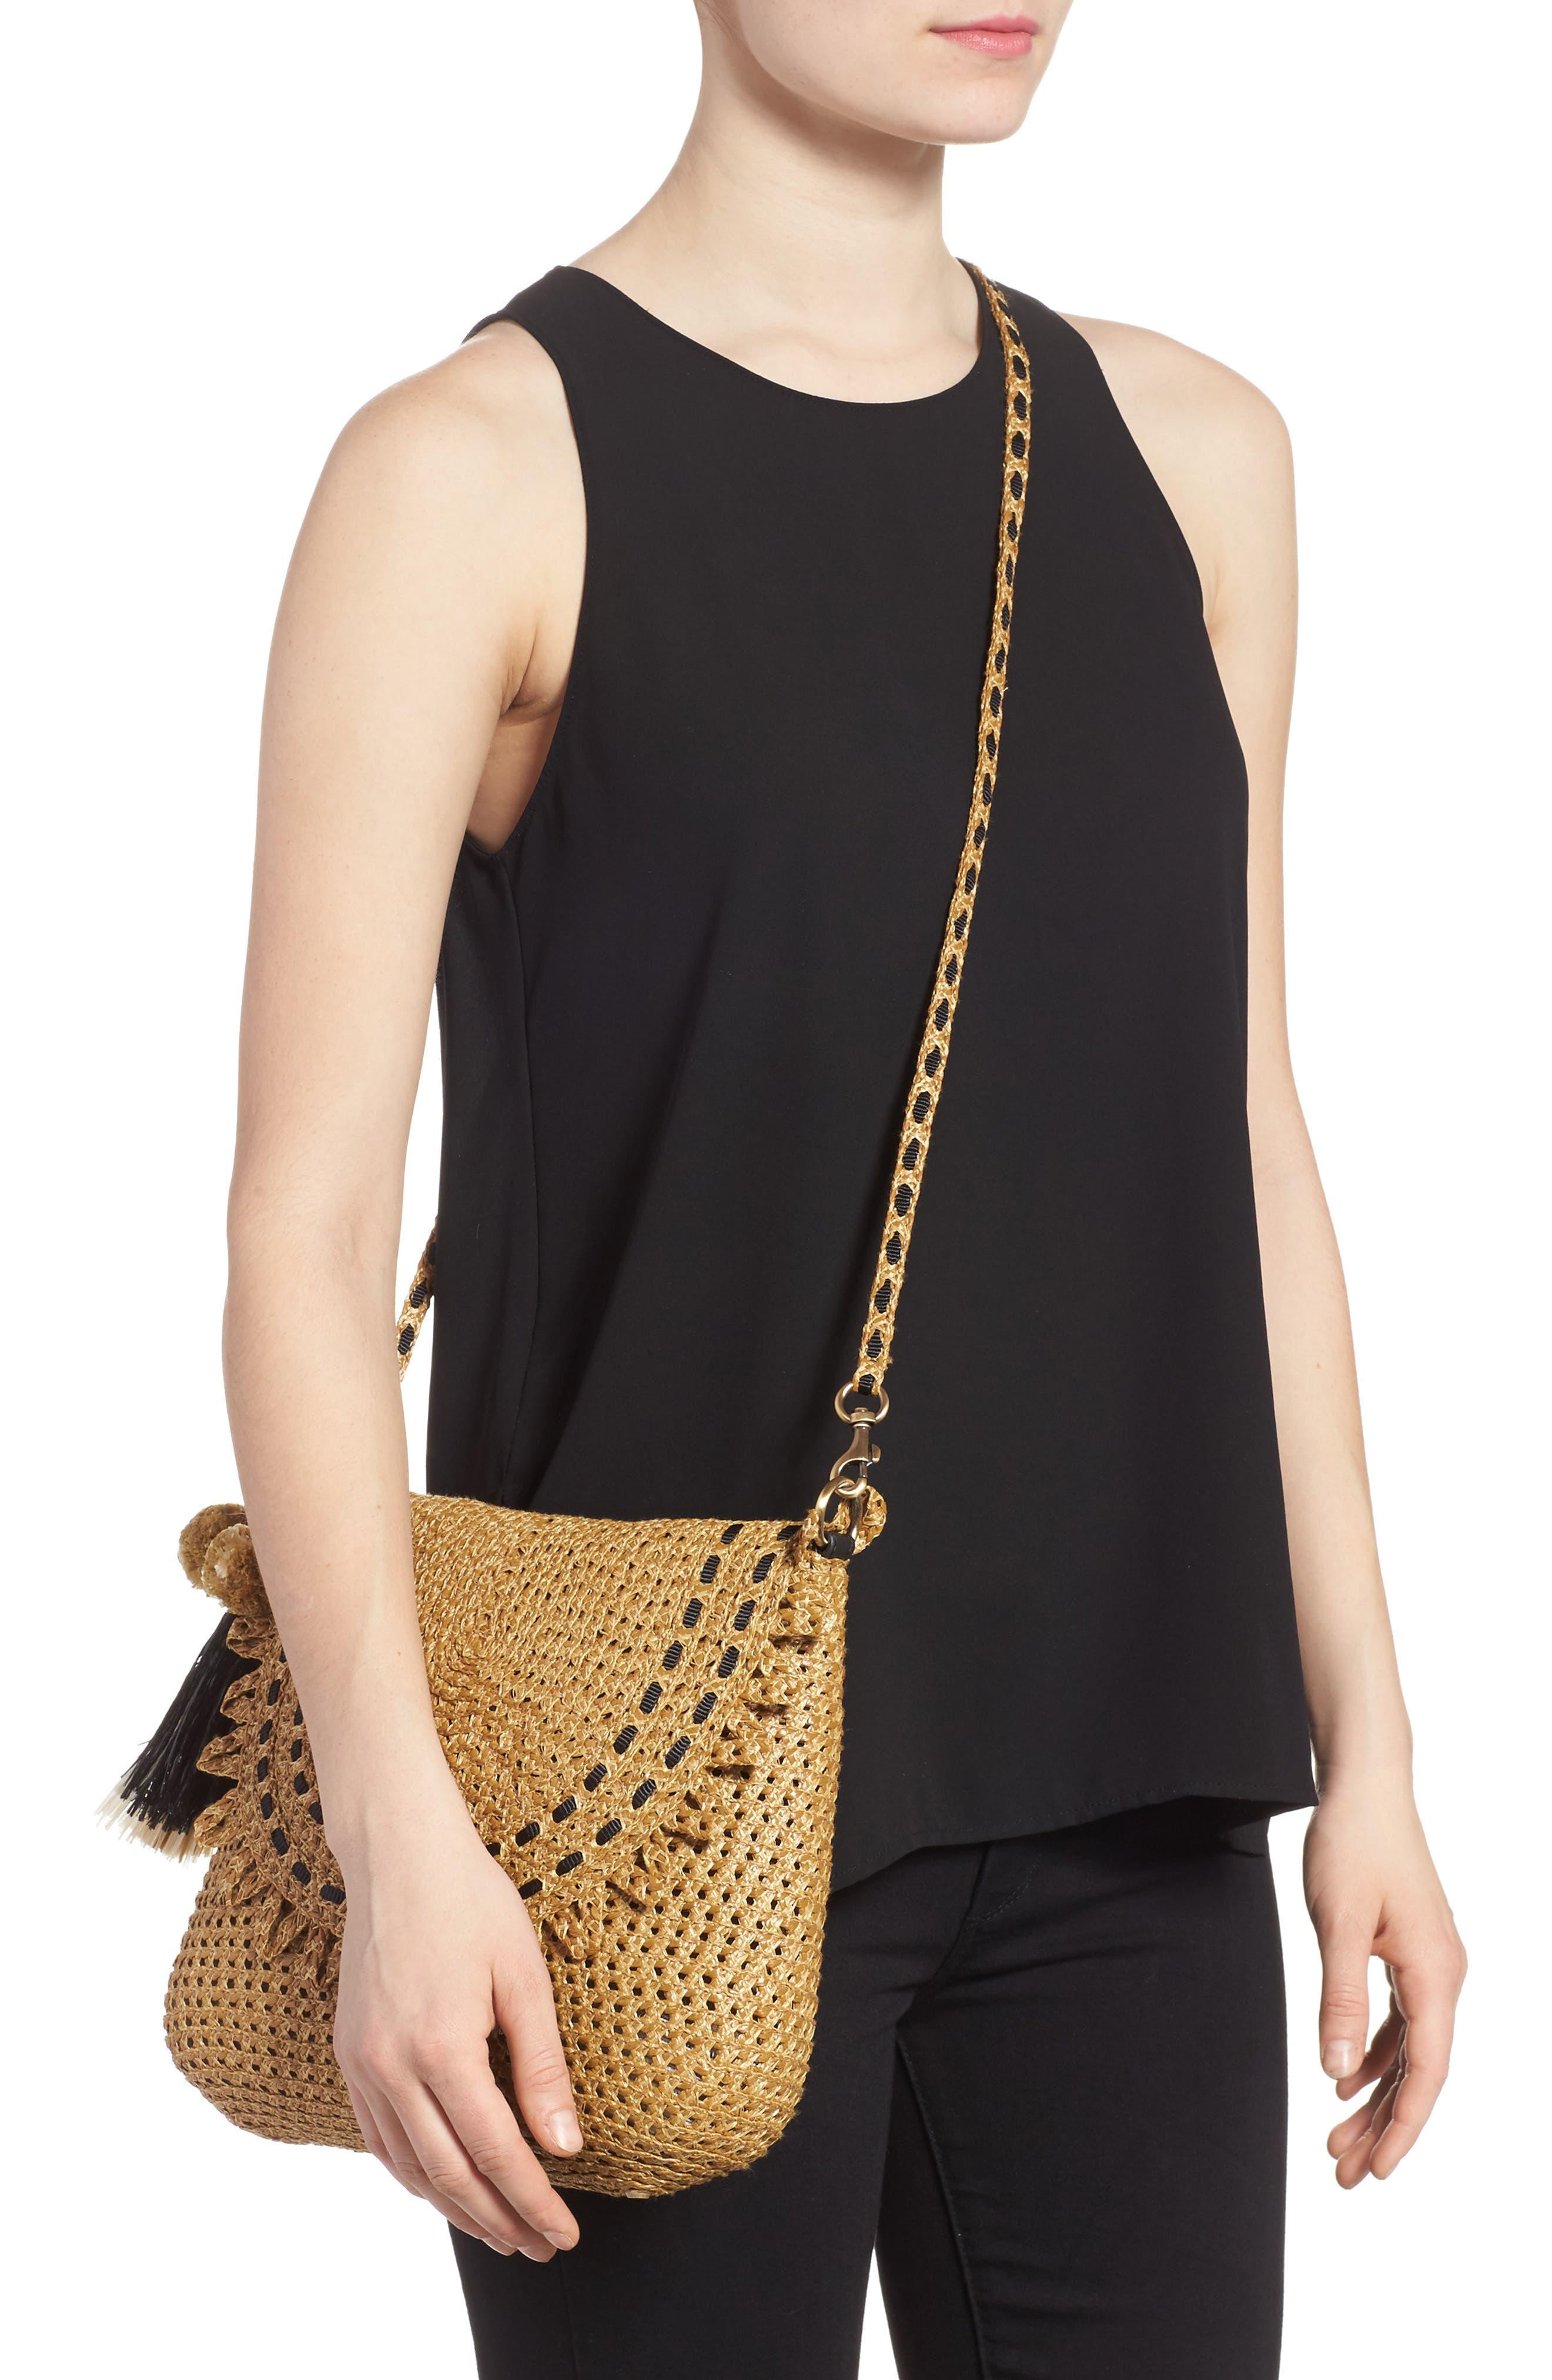 Brigitte Squishee<sup>®</sup> Shoulder Bag,                             Alternate thumbnail 2, color,                             Natural/ Black